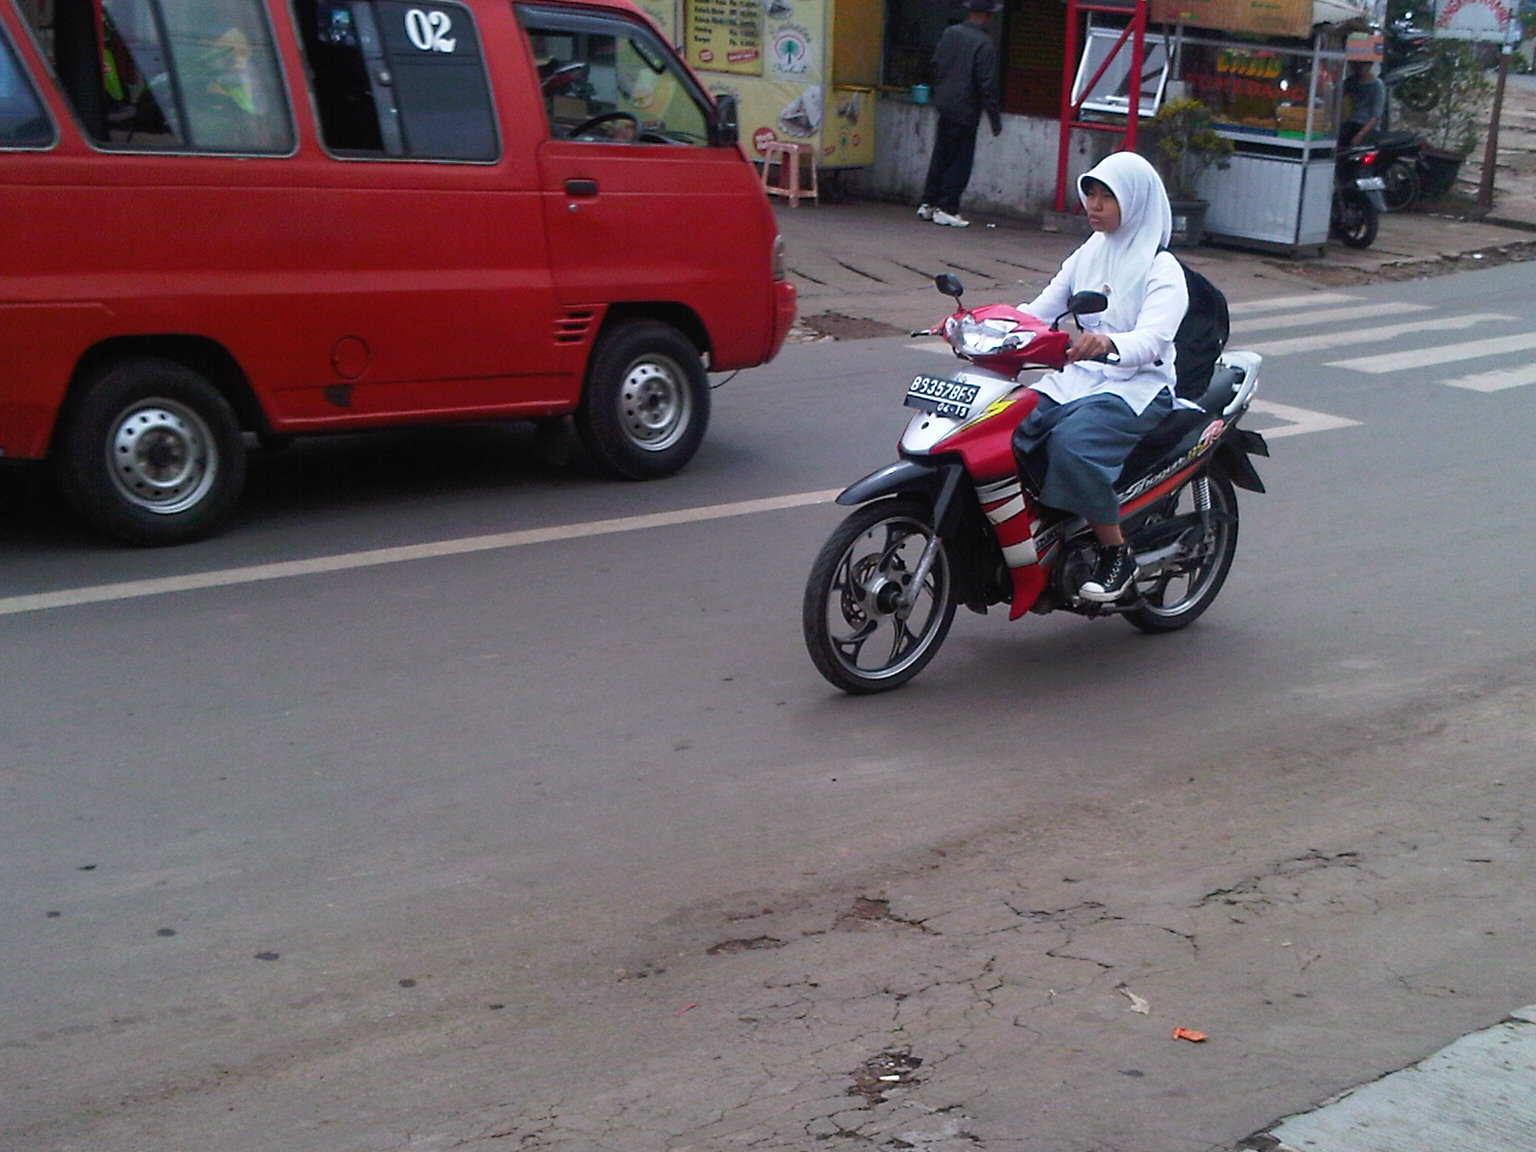 Anak Diberi Motor Agar Aman Edo Rusyantos Traffic